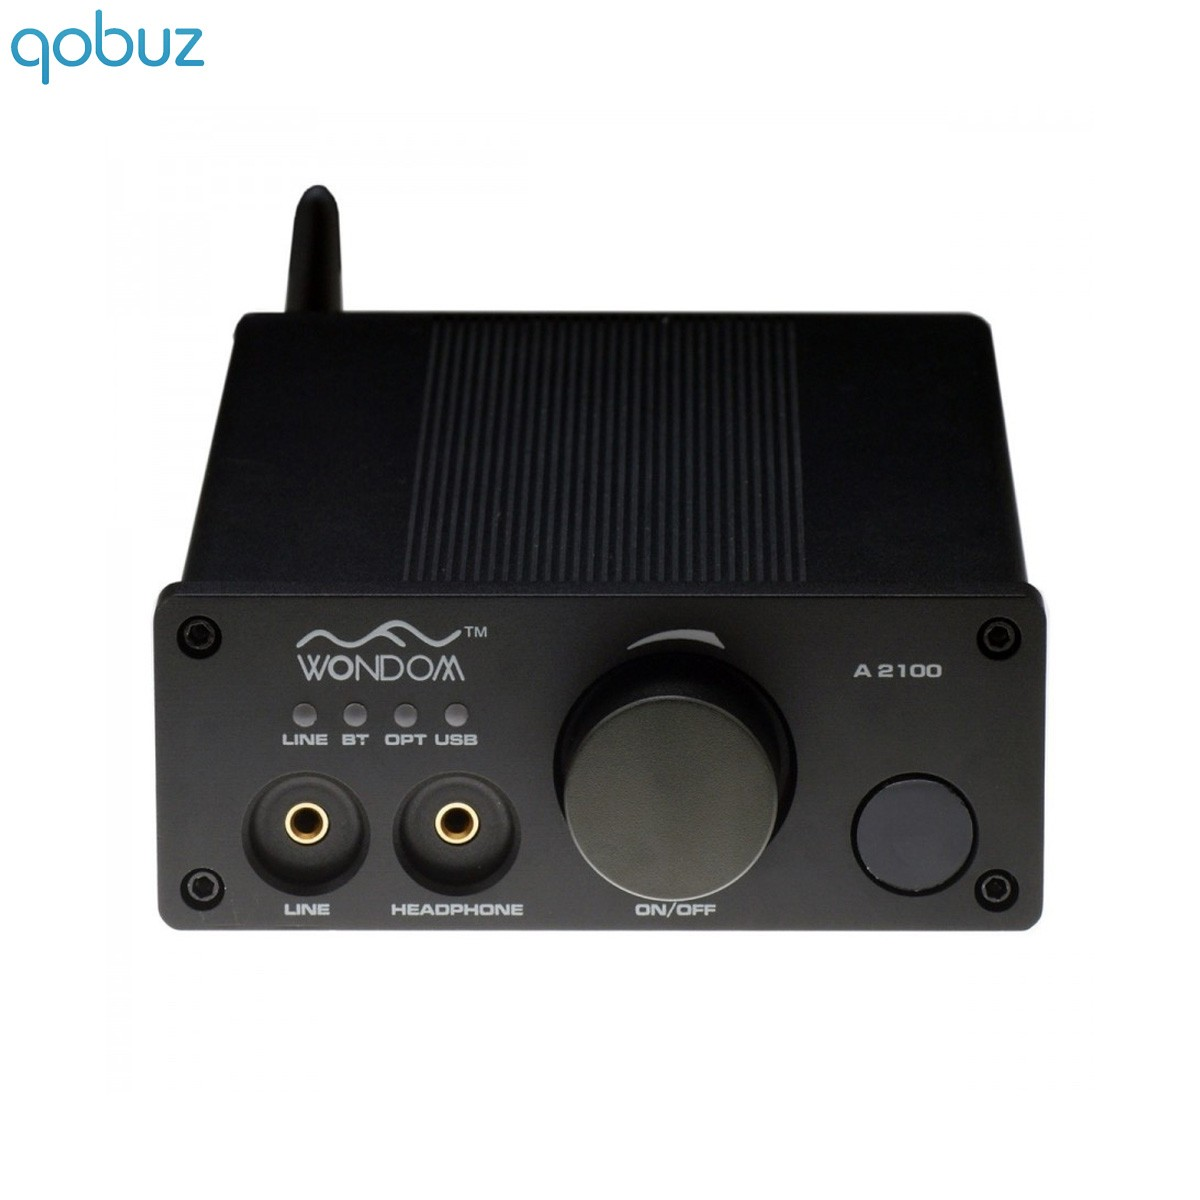 WONDOM A2100 V2 Class D 2.1 Amplifier Bluetooth 2x 100W / 6 Ohm